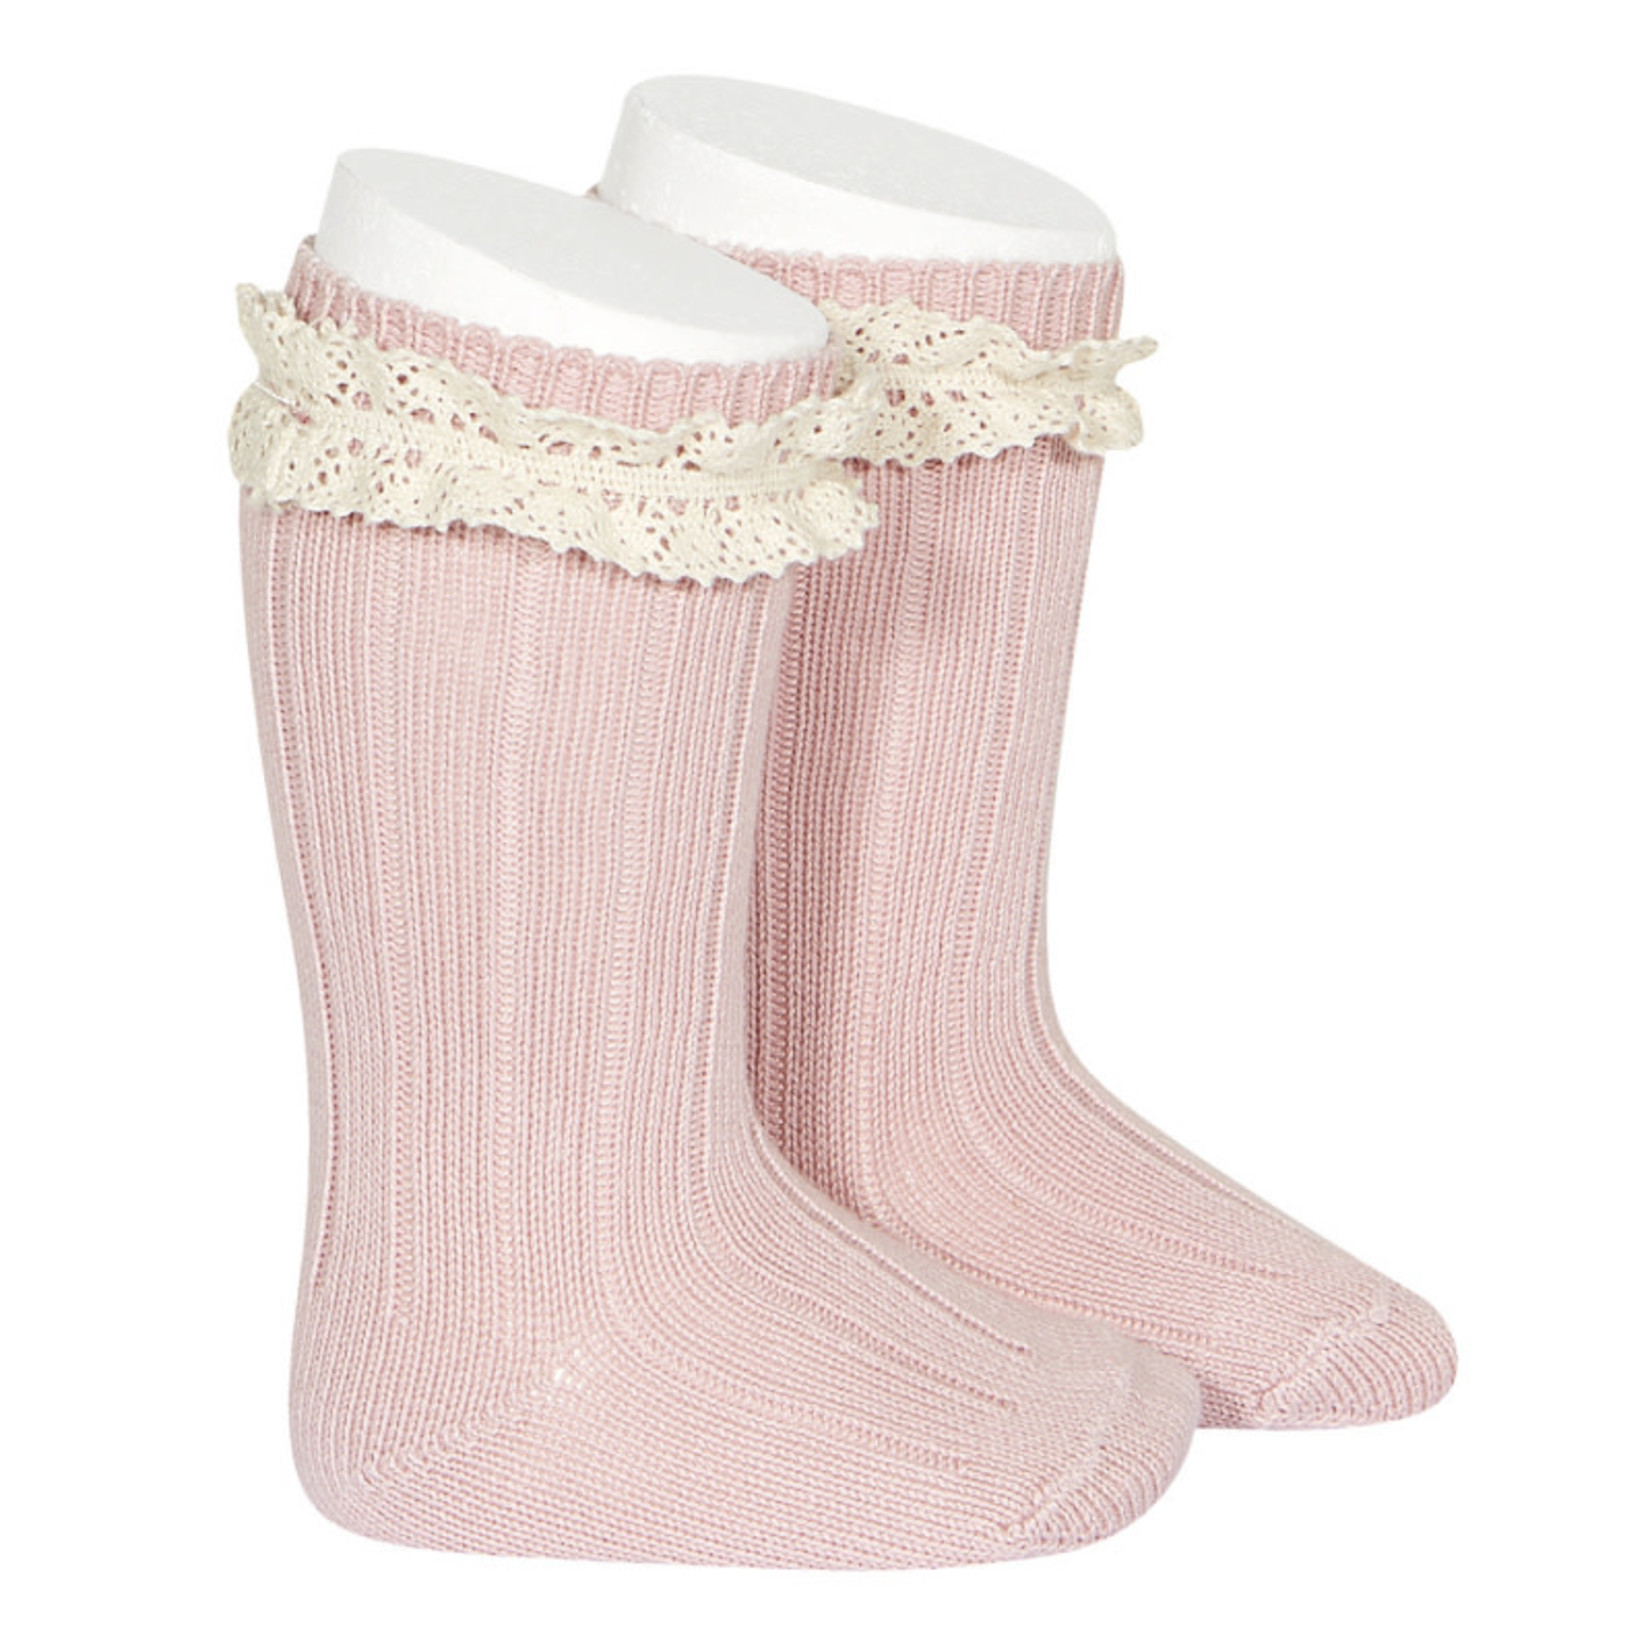 Condor Rib Knee High Socks Vintage - Pale Pink